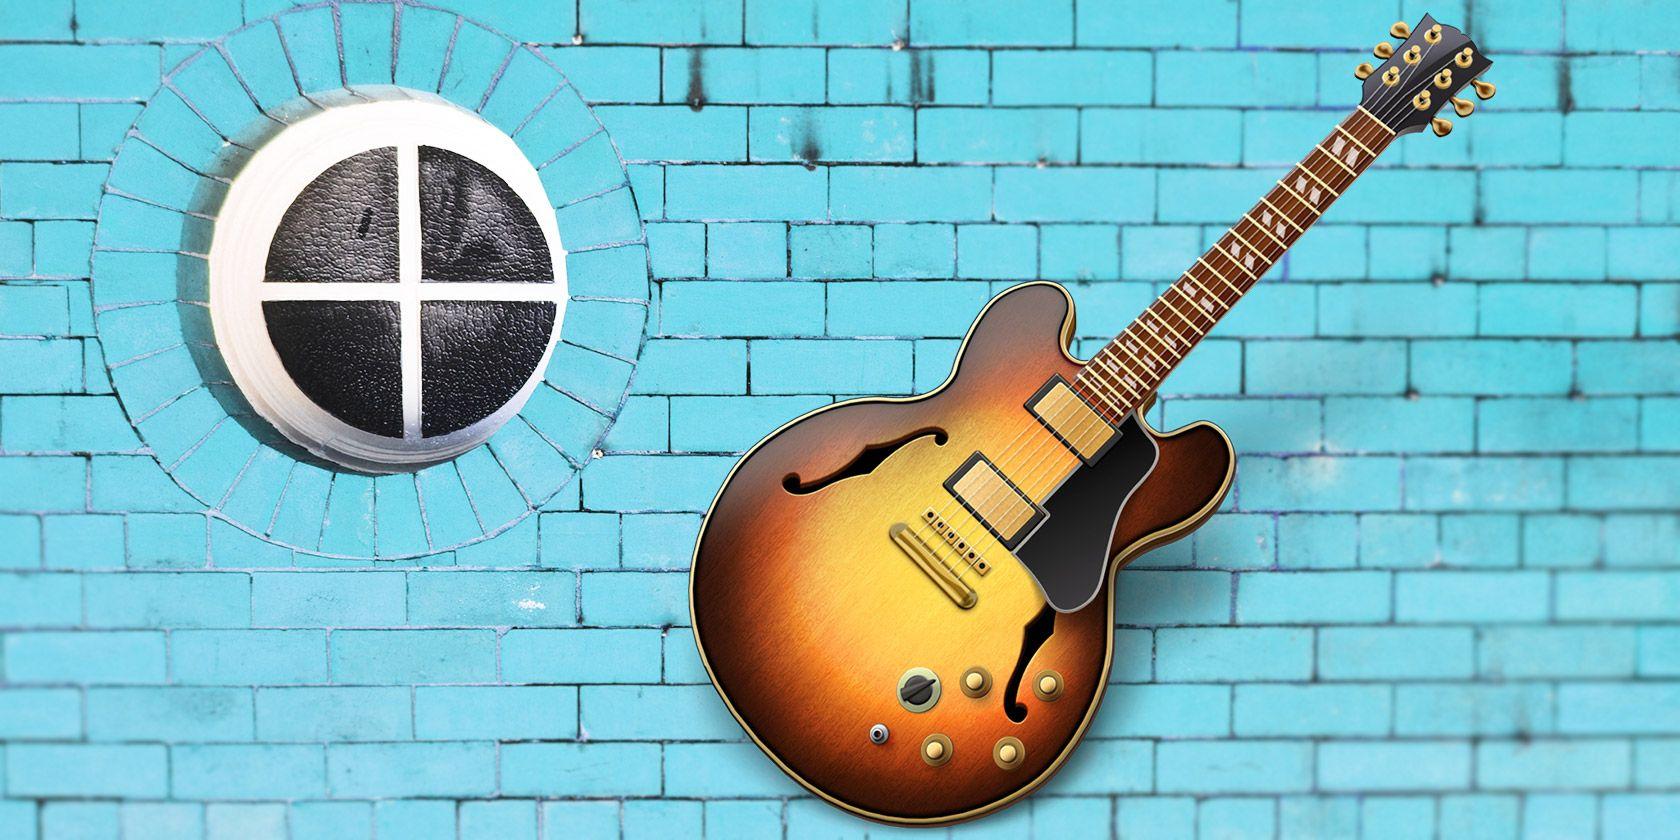 How to use garageband a stepbystep guide music music